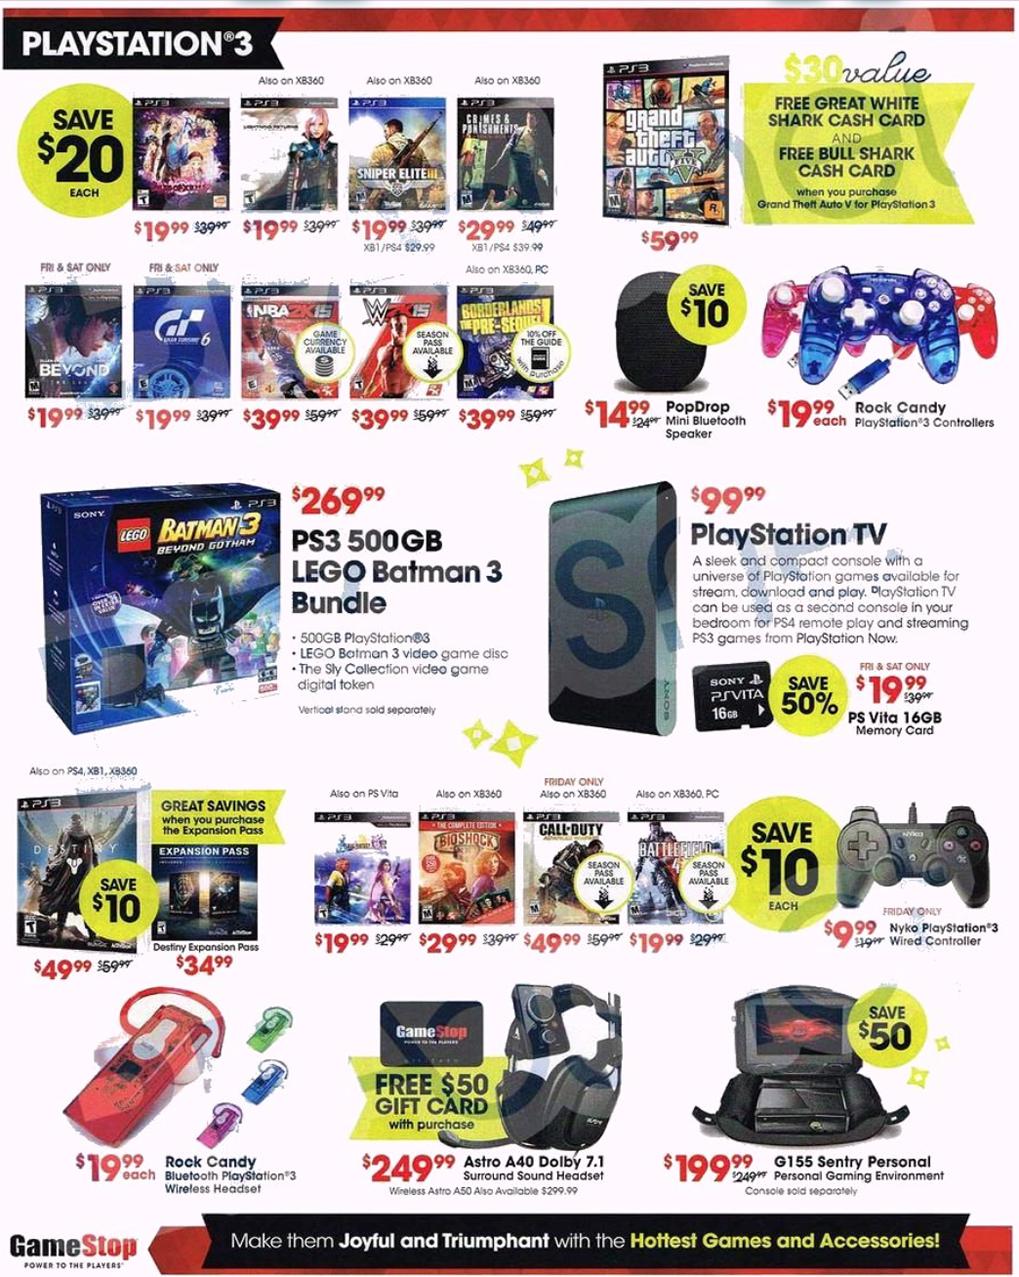 Gamestop Black Friday 2019 Ad & Sale Details - BlackerFriday com